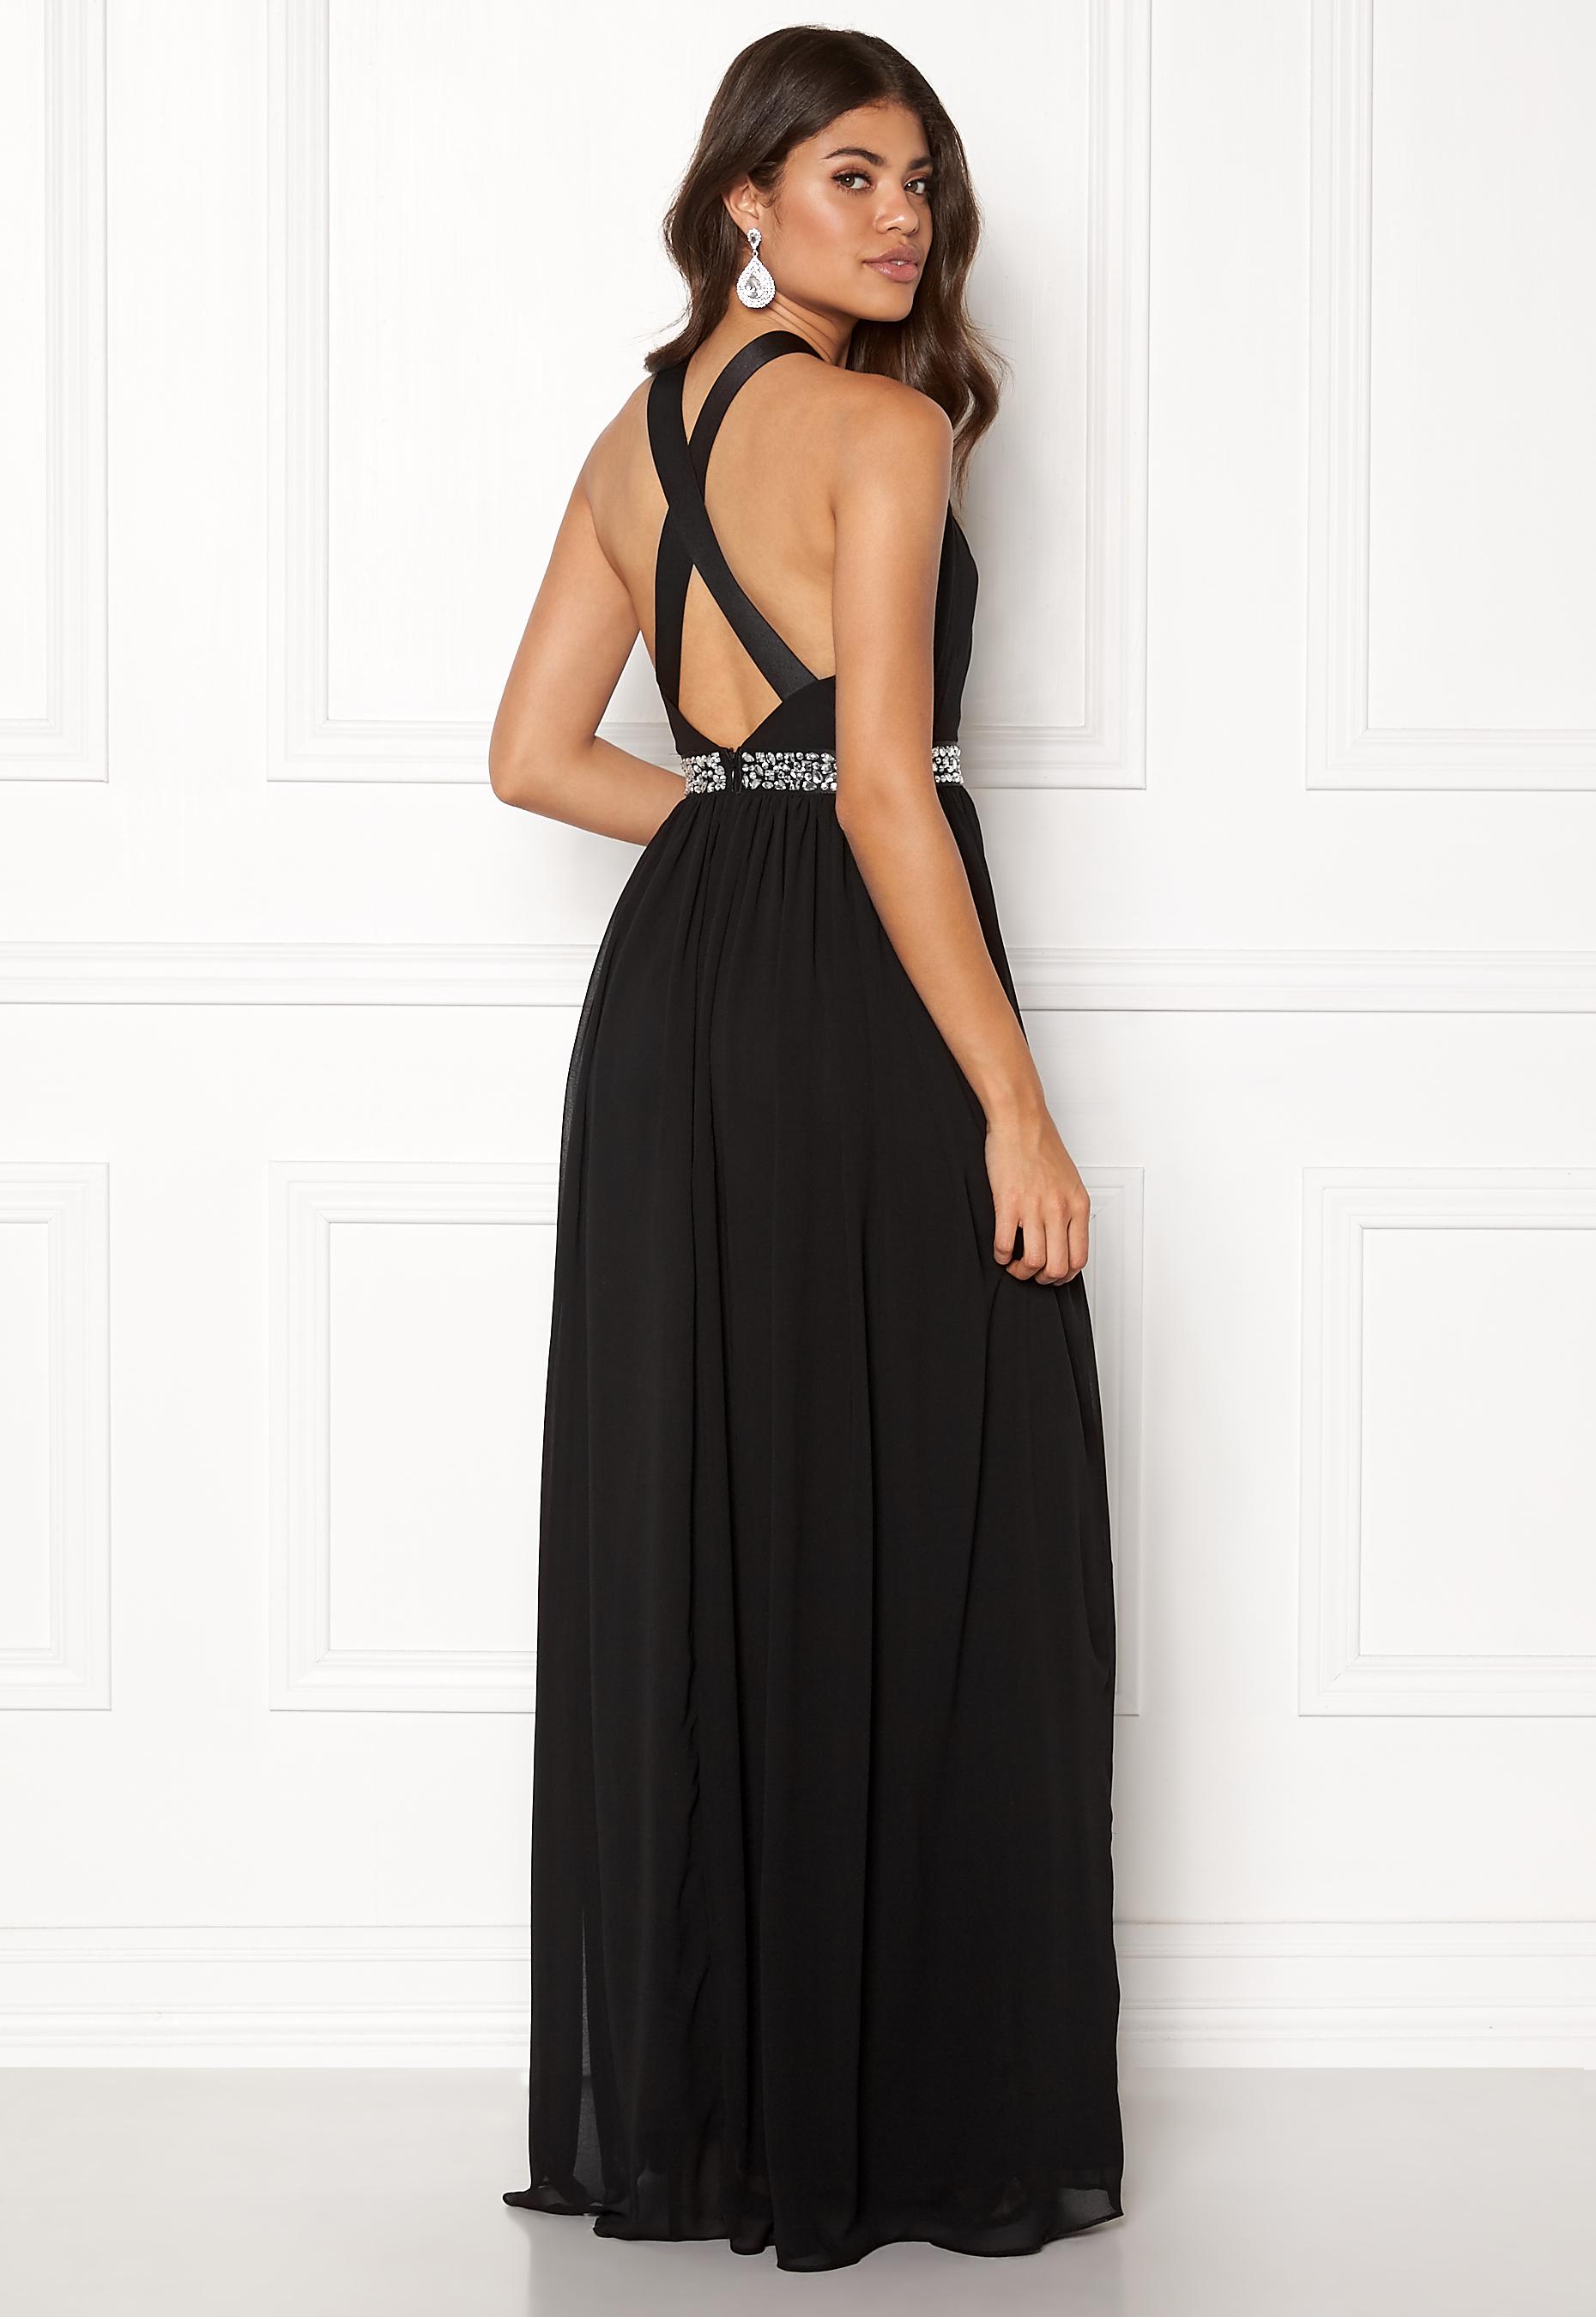 63196767d93a Goddiva Halter Neck Chiffon Dress Black - Bubbleroom